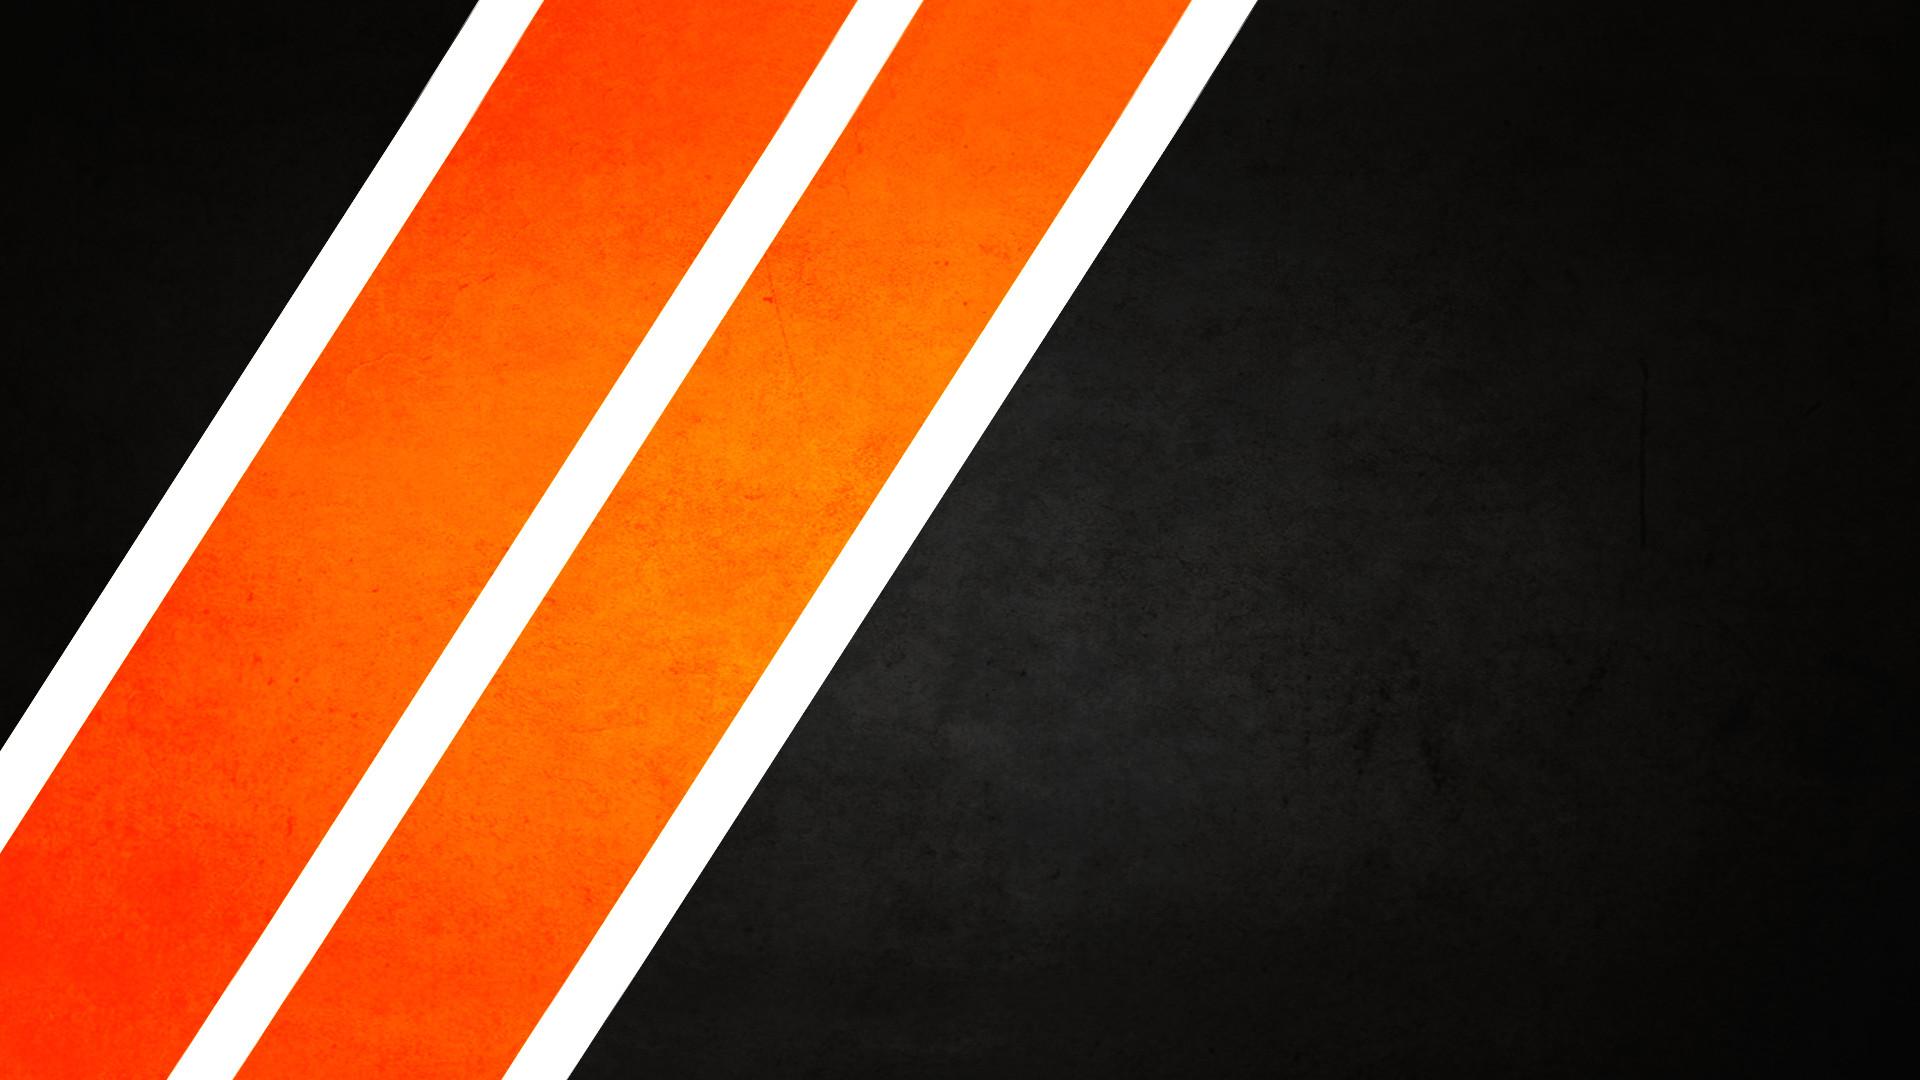 px Orange Abstract Desktop Photos